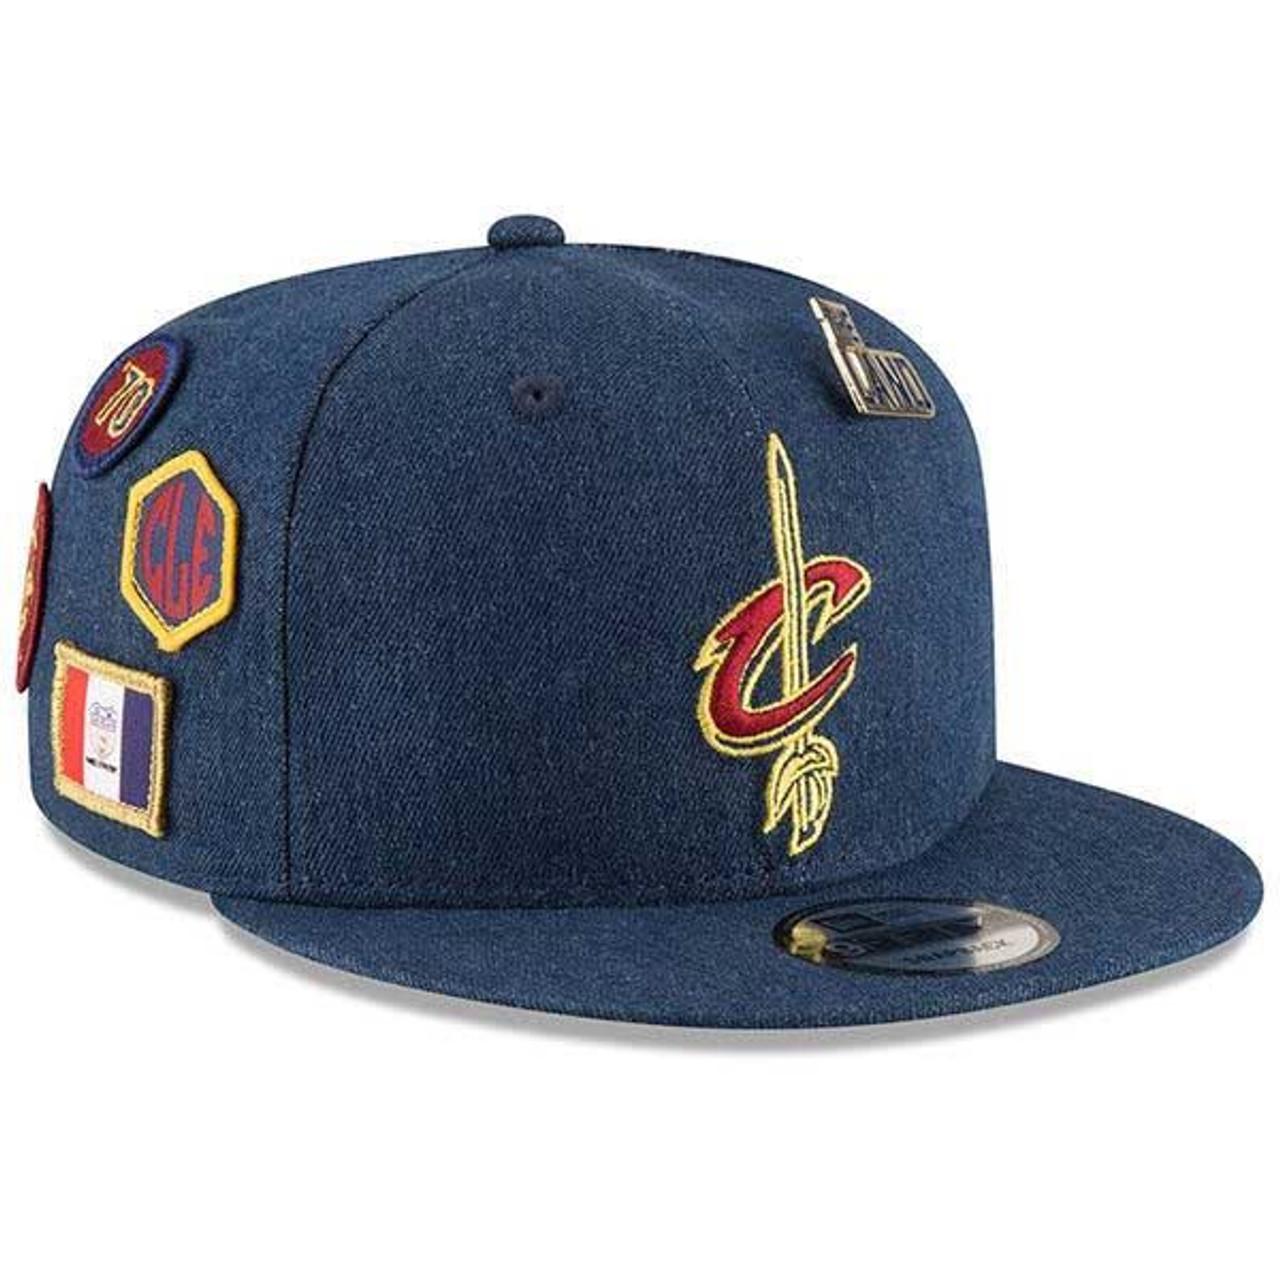 watch abbf1 900f3 18-19 Draft Series Snapback Denim Cap - Cleveland Cavaliers